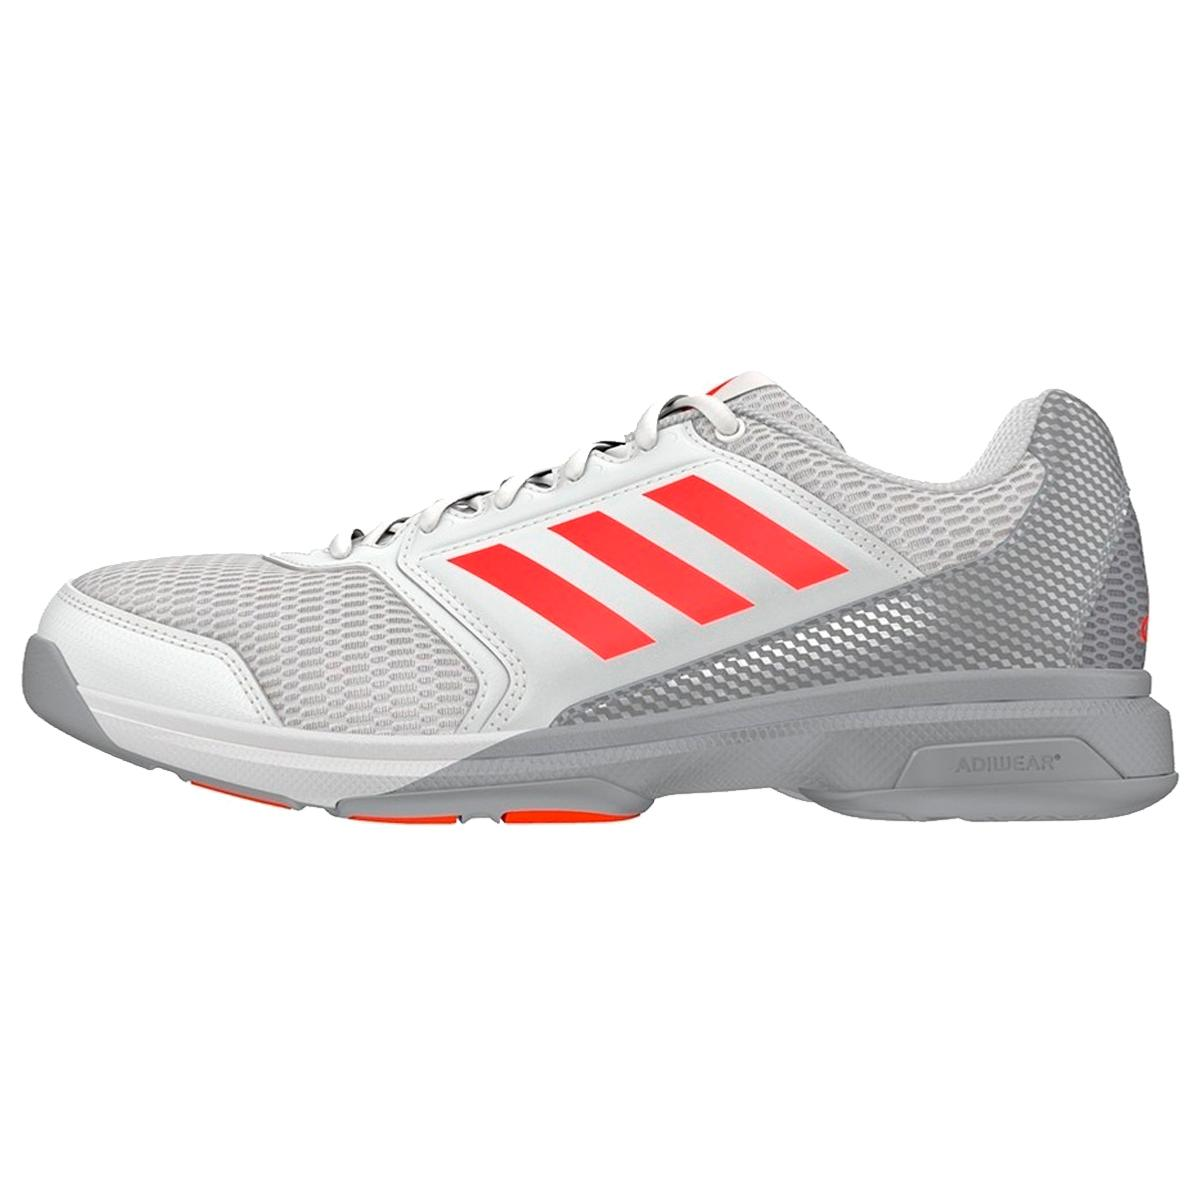 Adidas Multido Essence Squash Shoes